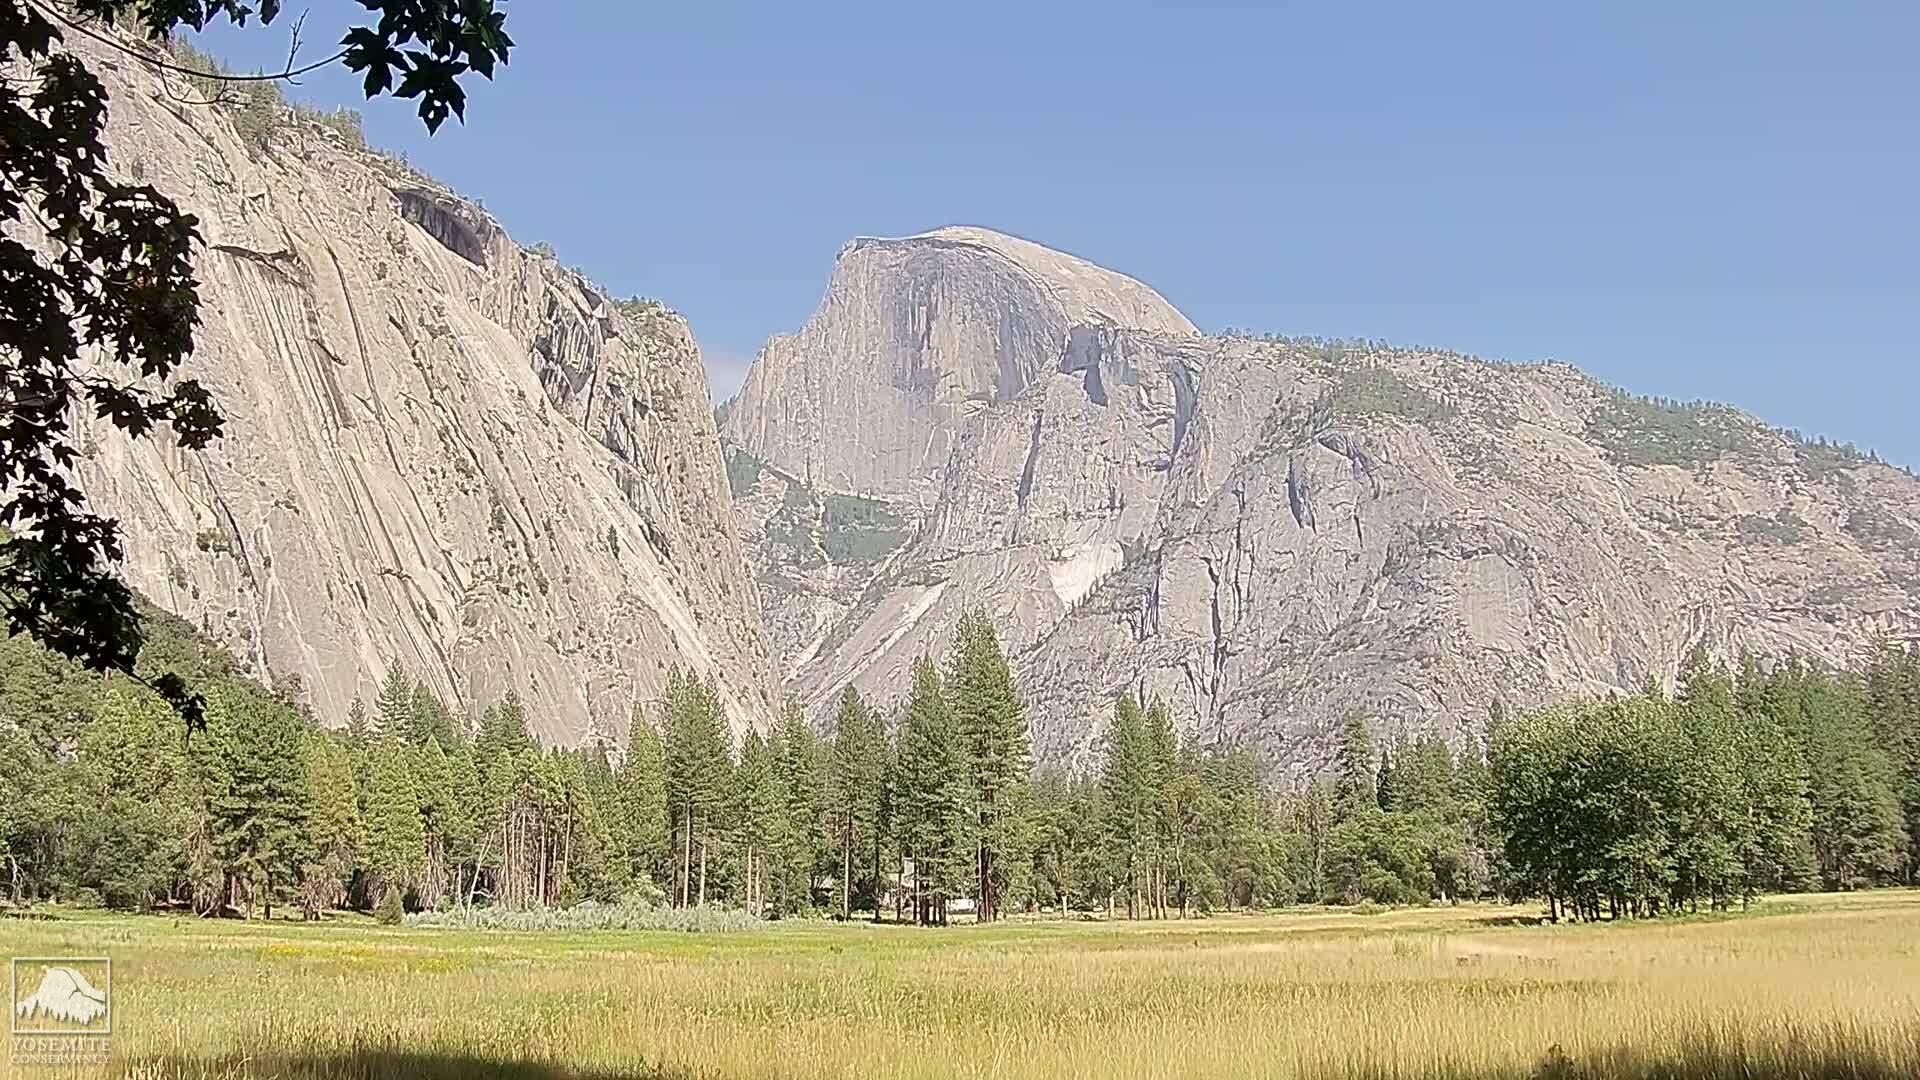 Yosemite National Park, California Tue. 15:45